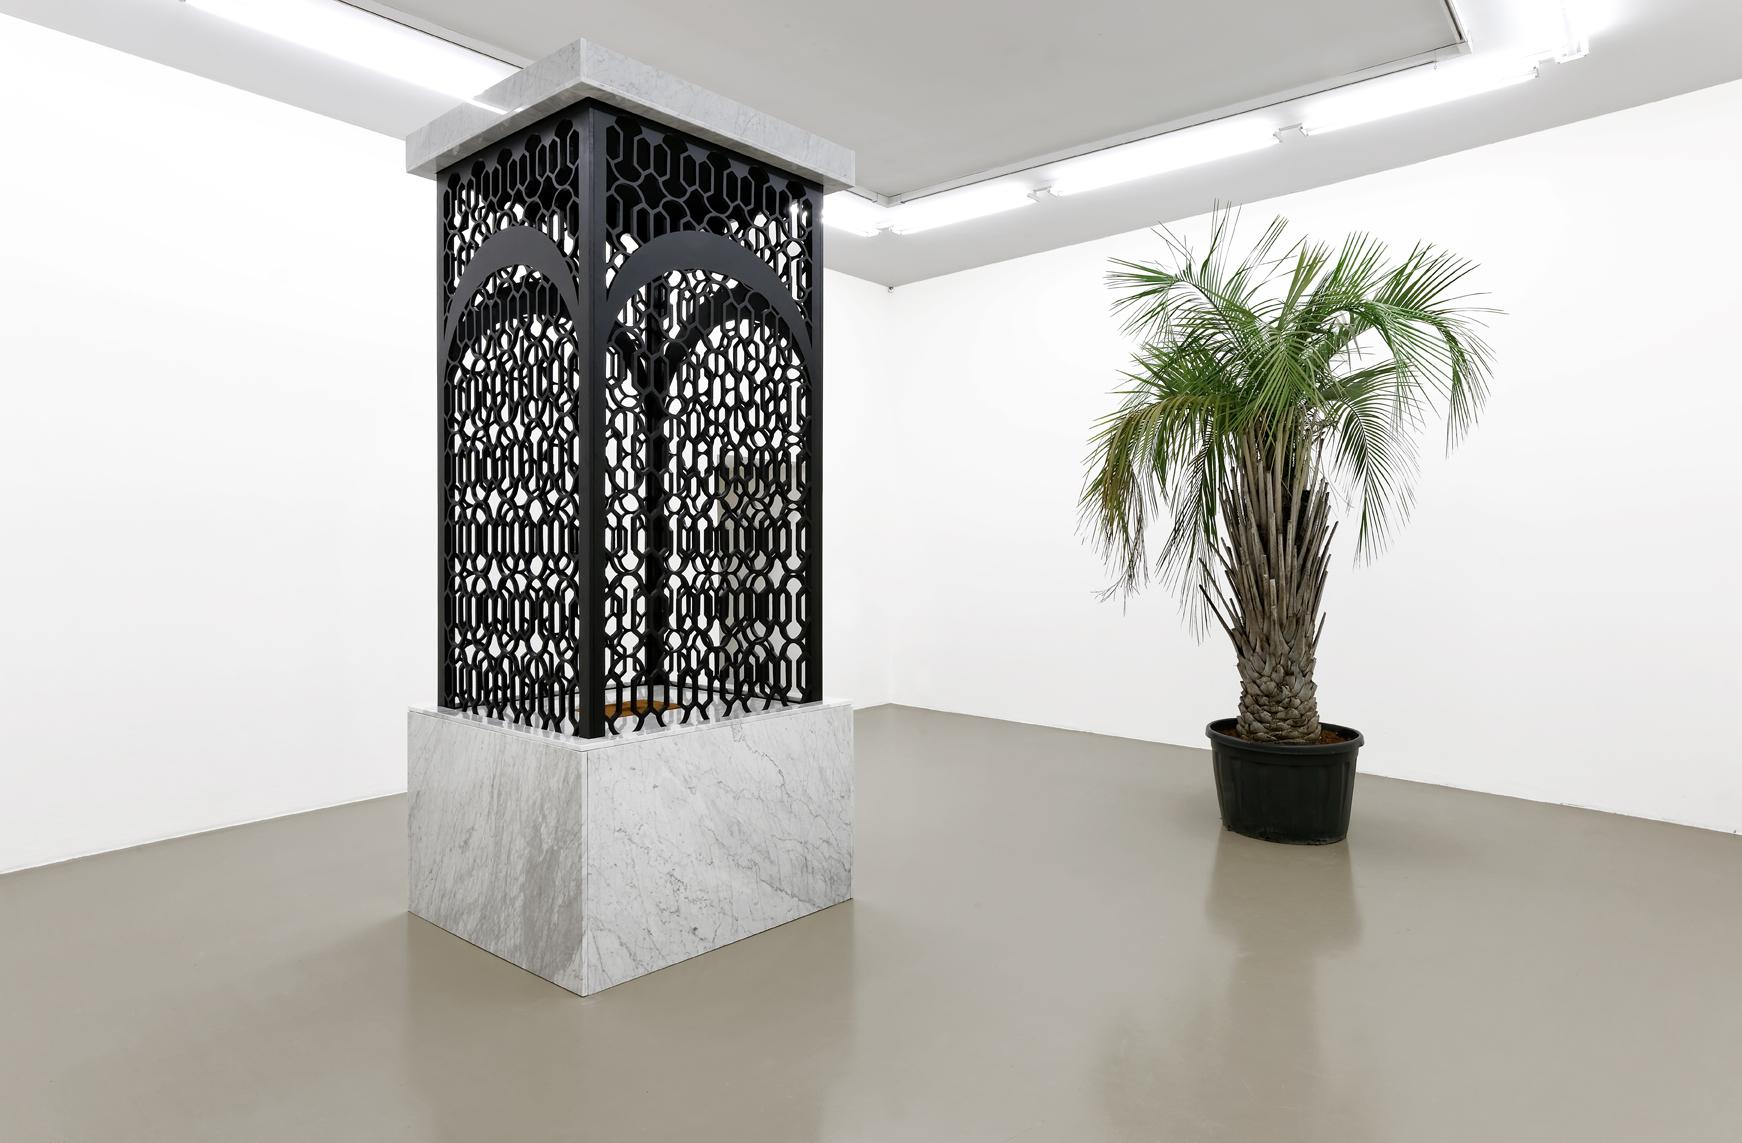 Mehdi-Georges Lahlou,  Les talons d'Abraham, marble, wood, cinnamon, various materials 320 x 180 x 180 cm, 2016 - Courtesy the artist and Rabouan Moussion Gallery Paris